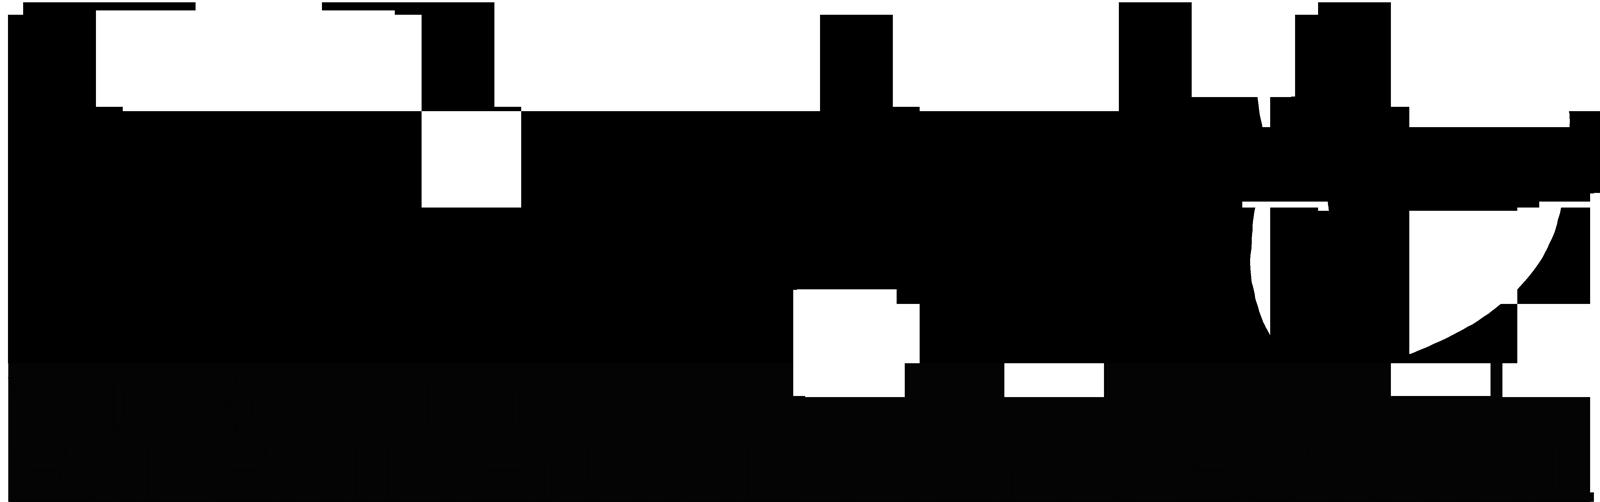 burnt video art and experimental film festival